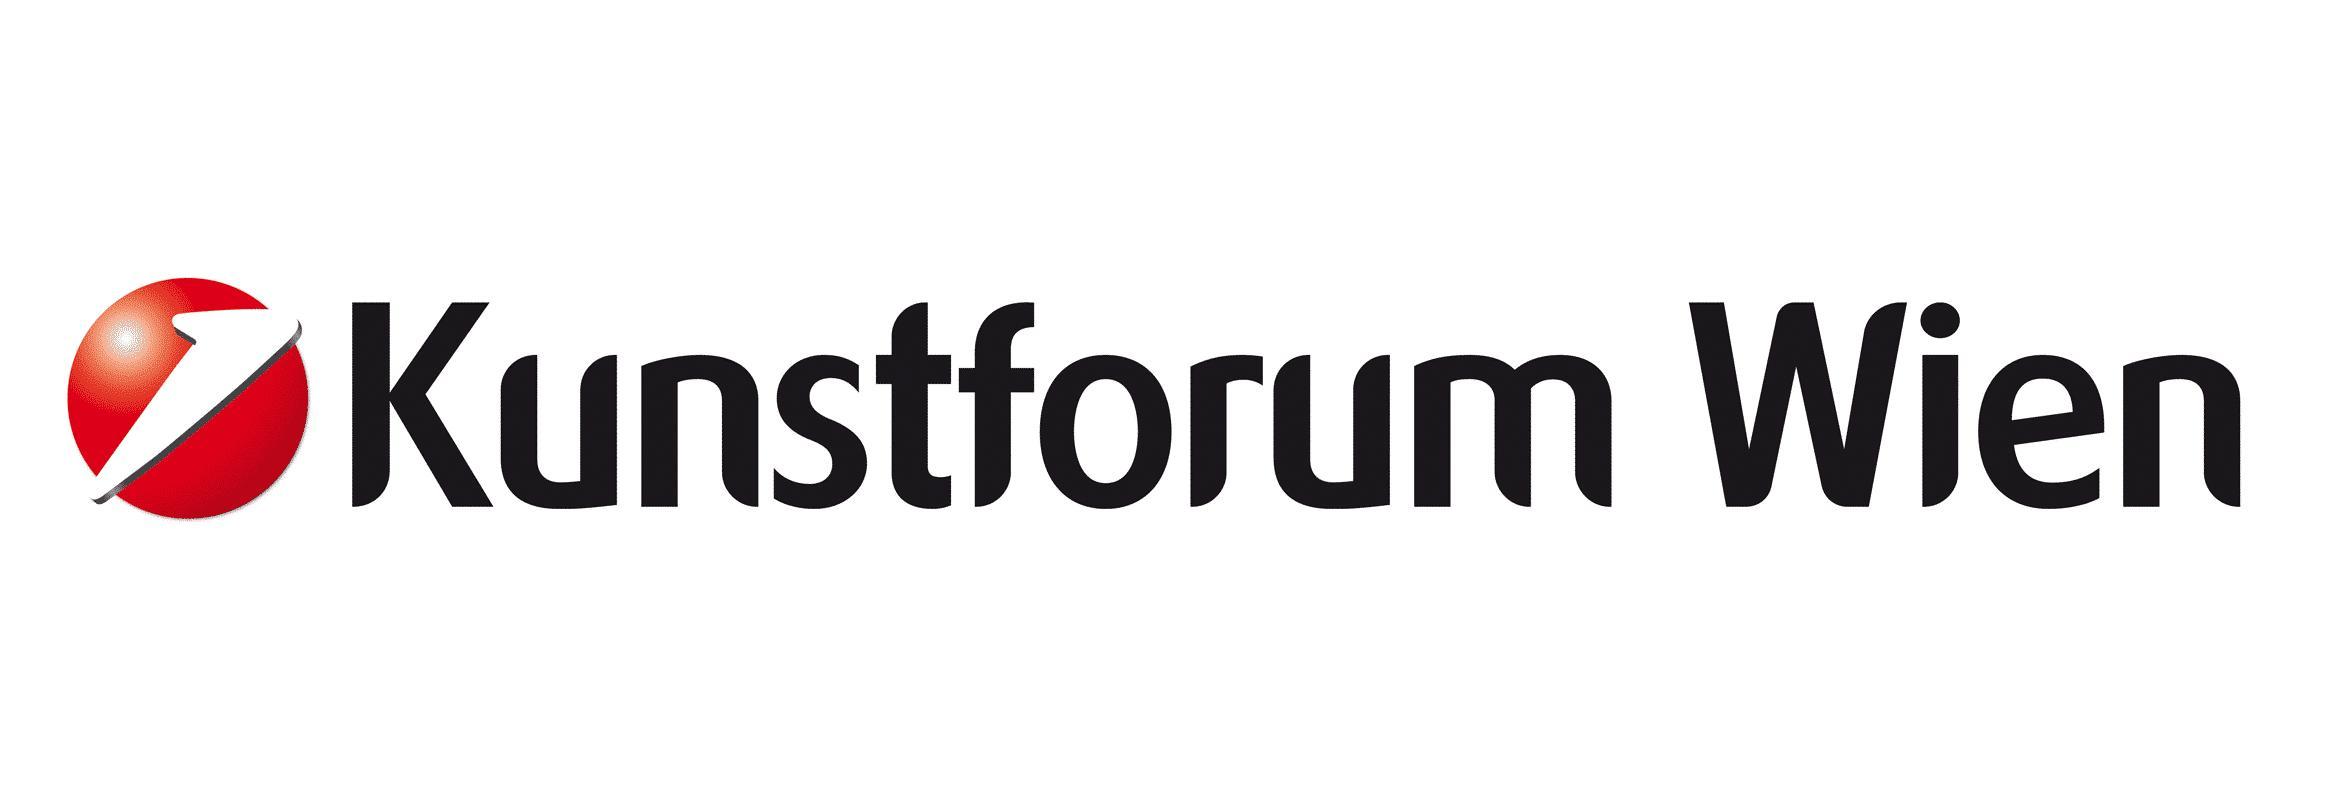 logo kunstforum web